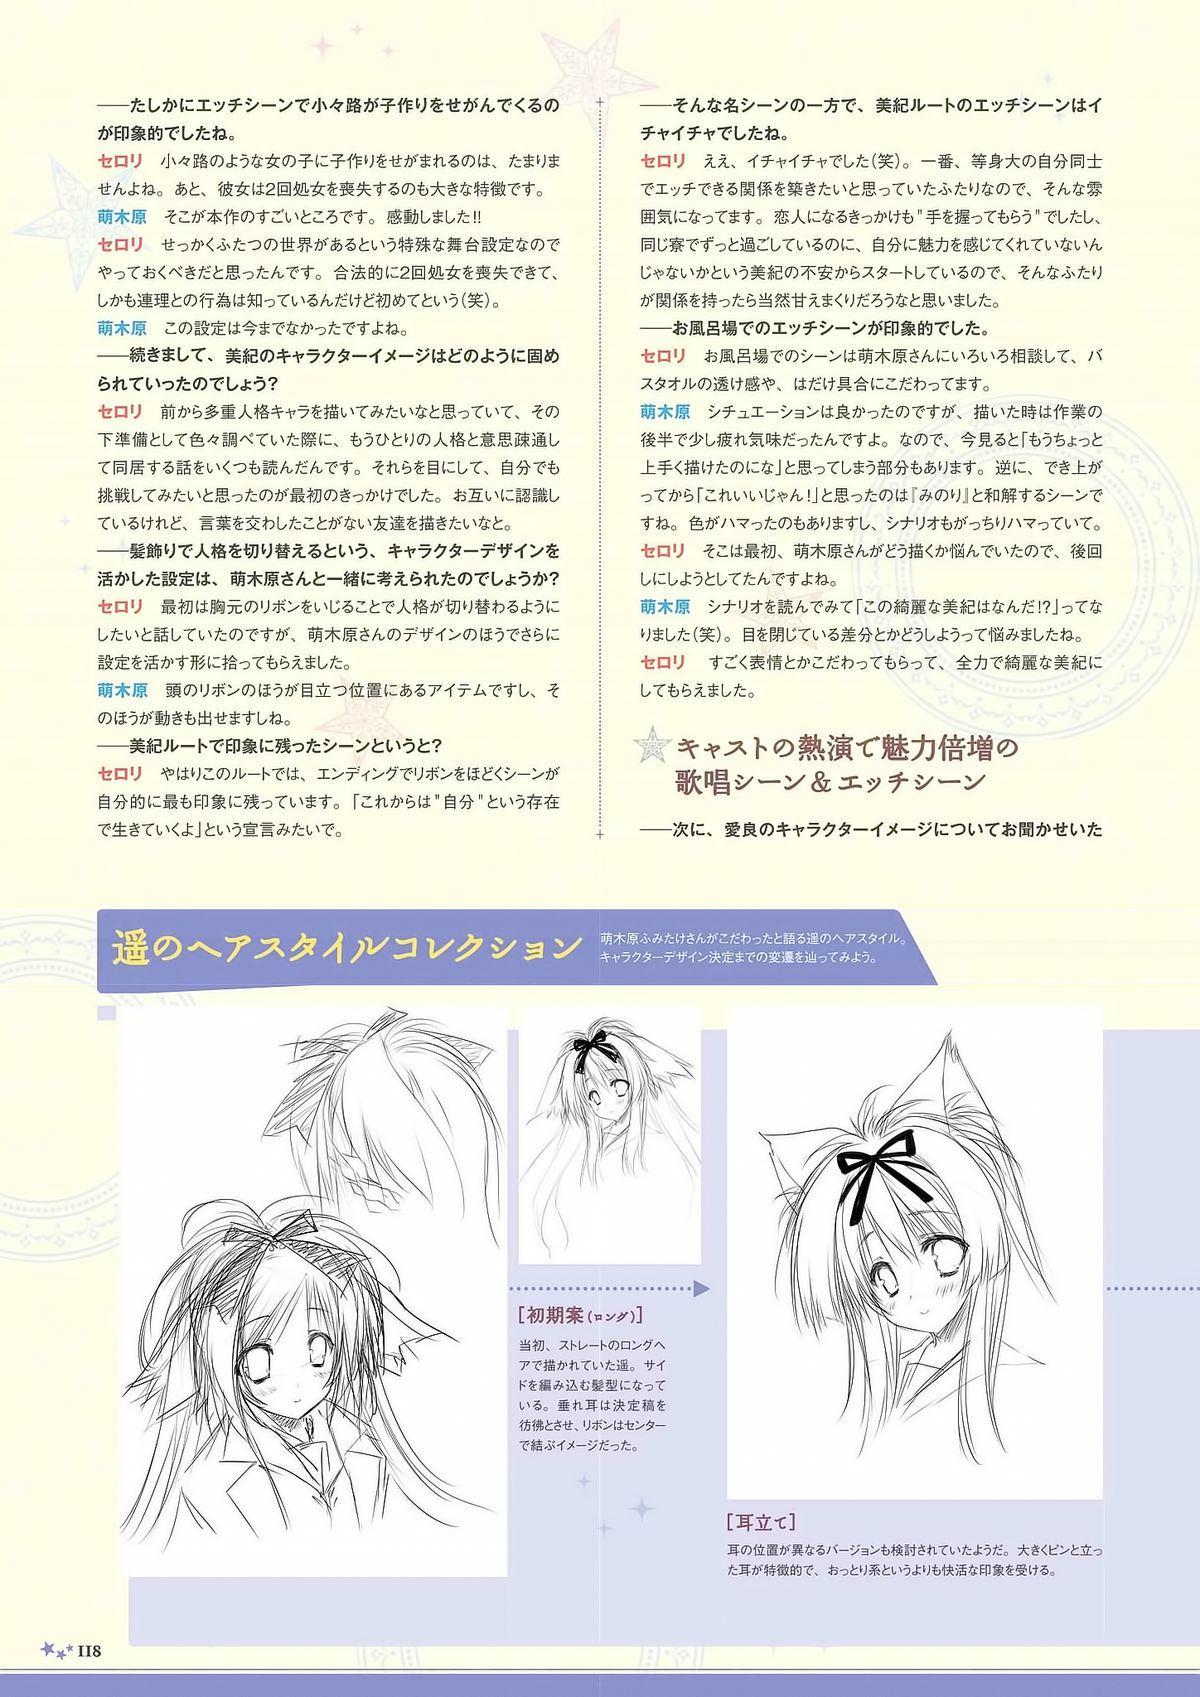 Sekai to Sekai no Mannaka de Visual Fanbook 115